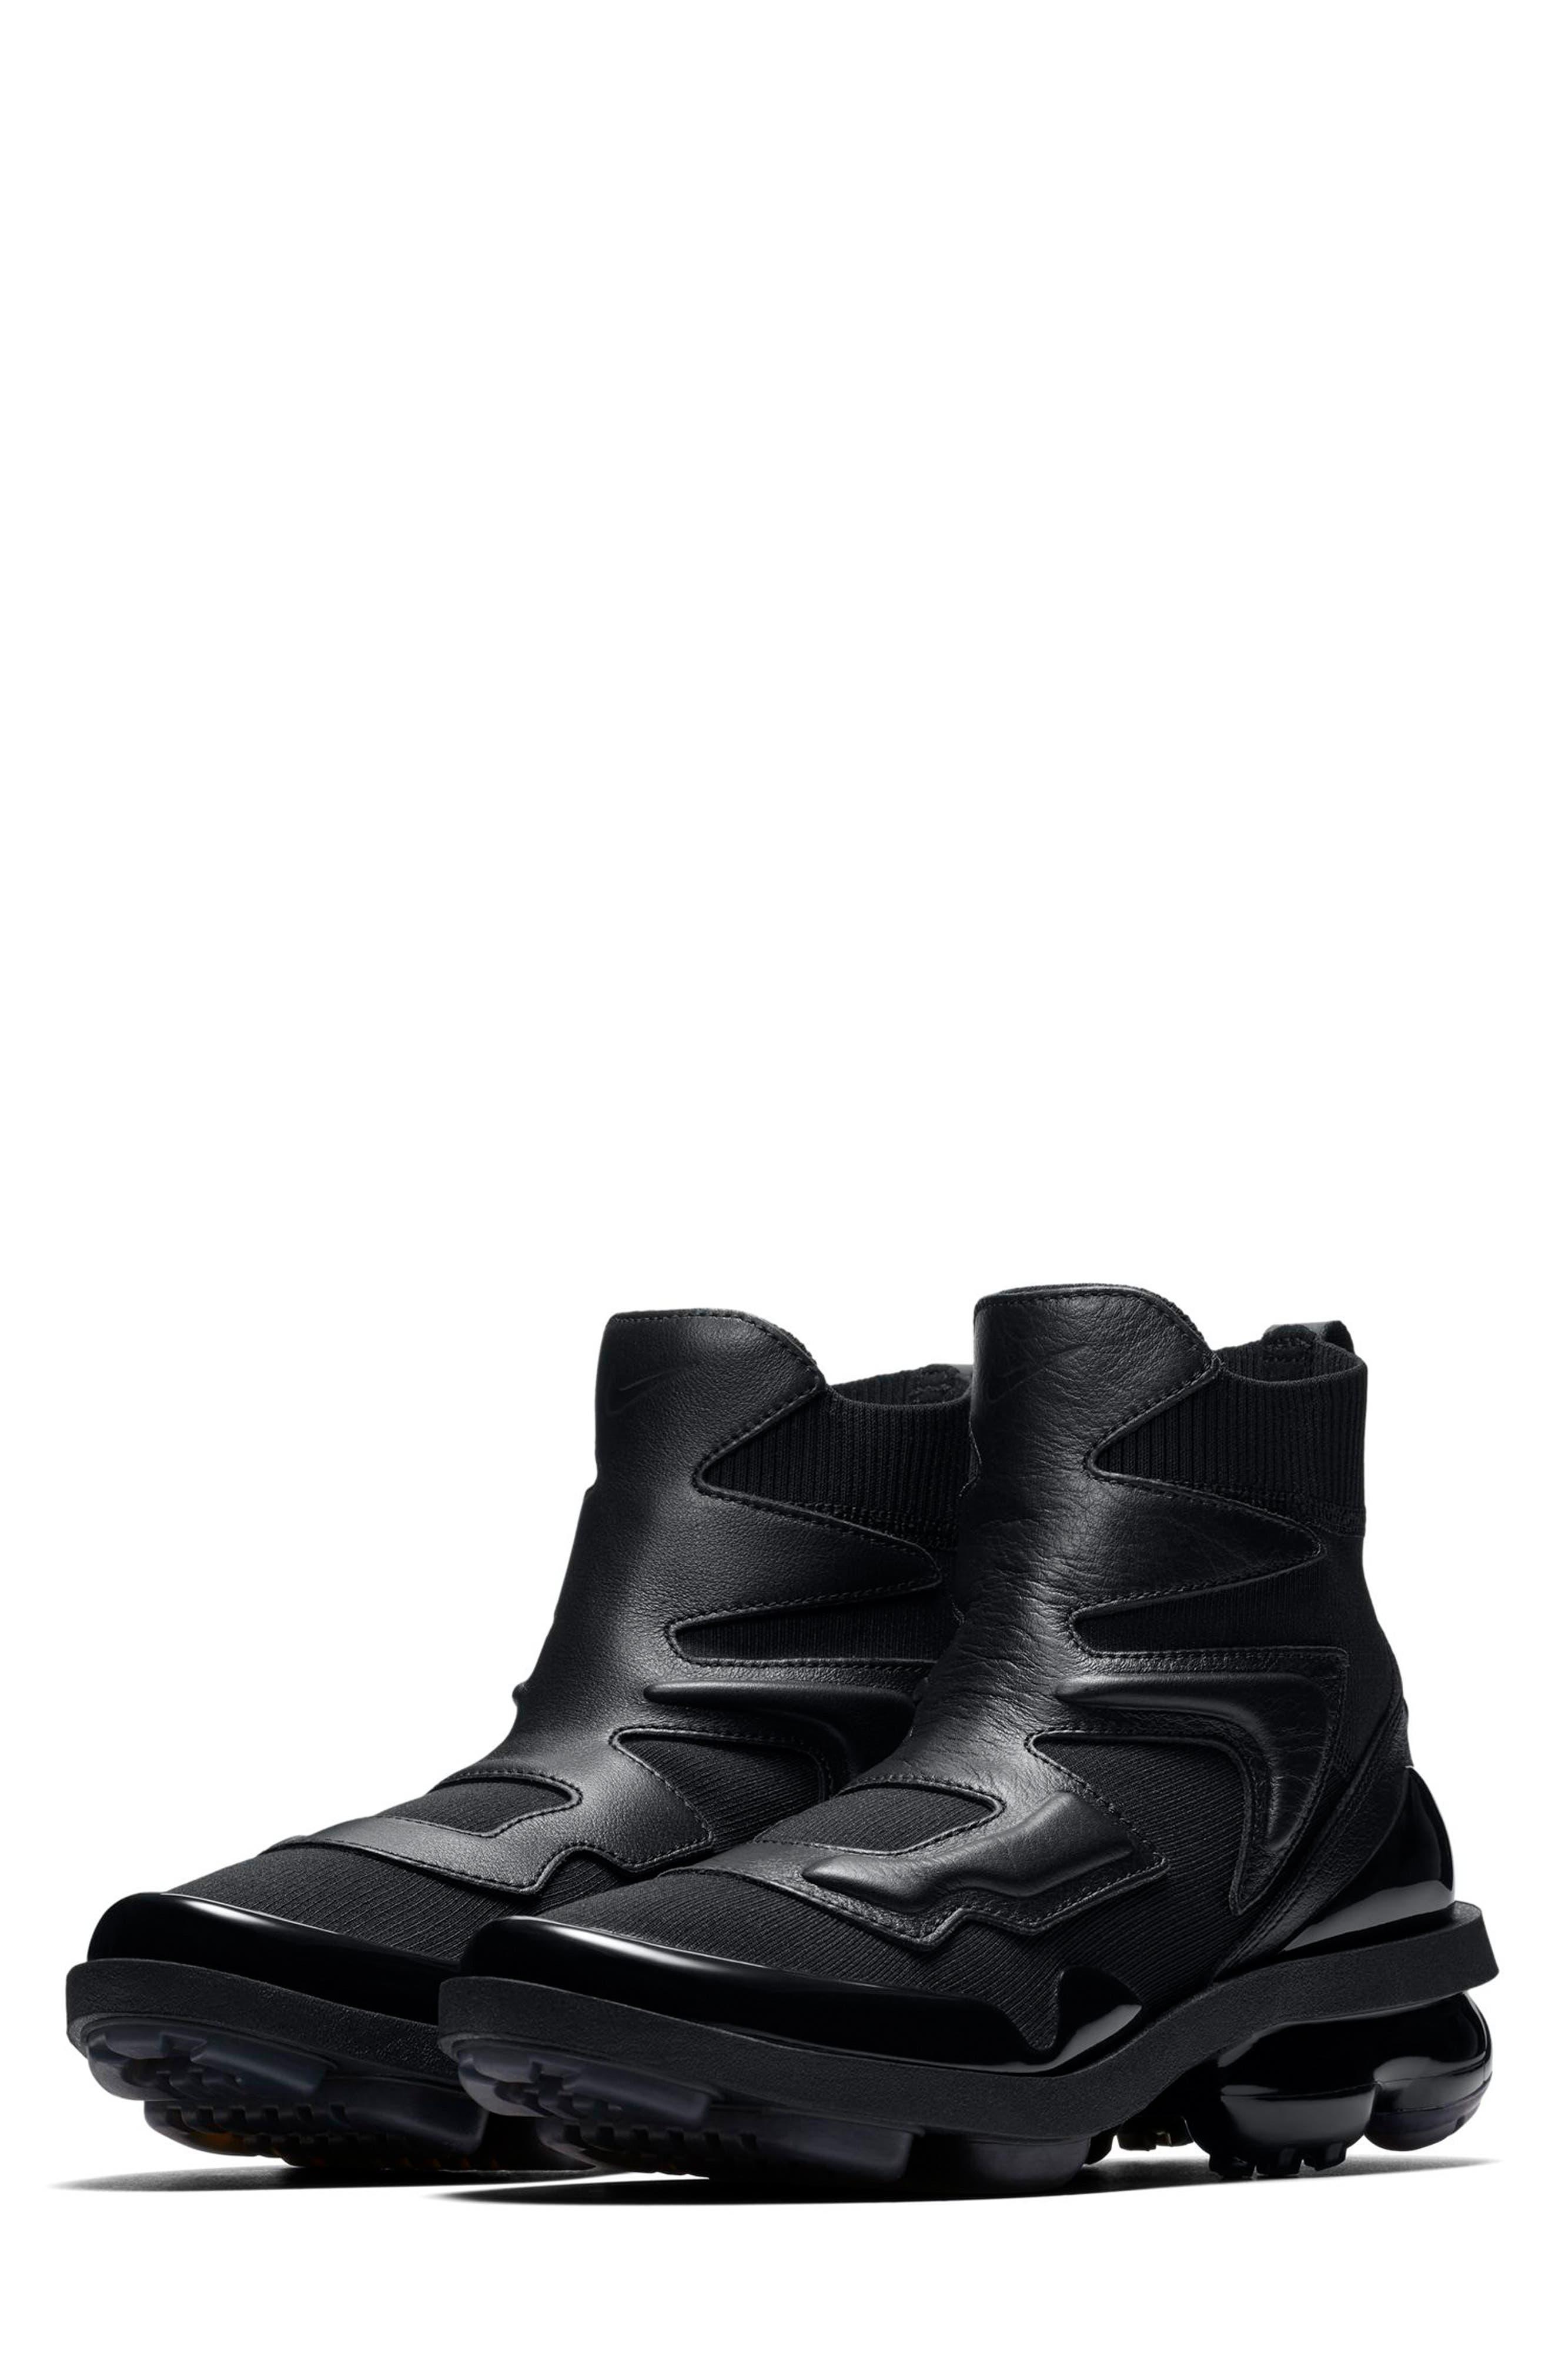 Air Vapormax Light II Sneaker,                         Main,                         color, BLACK/ BLACK